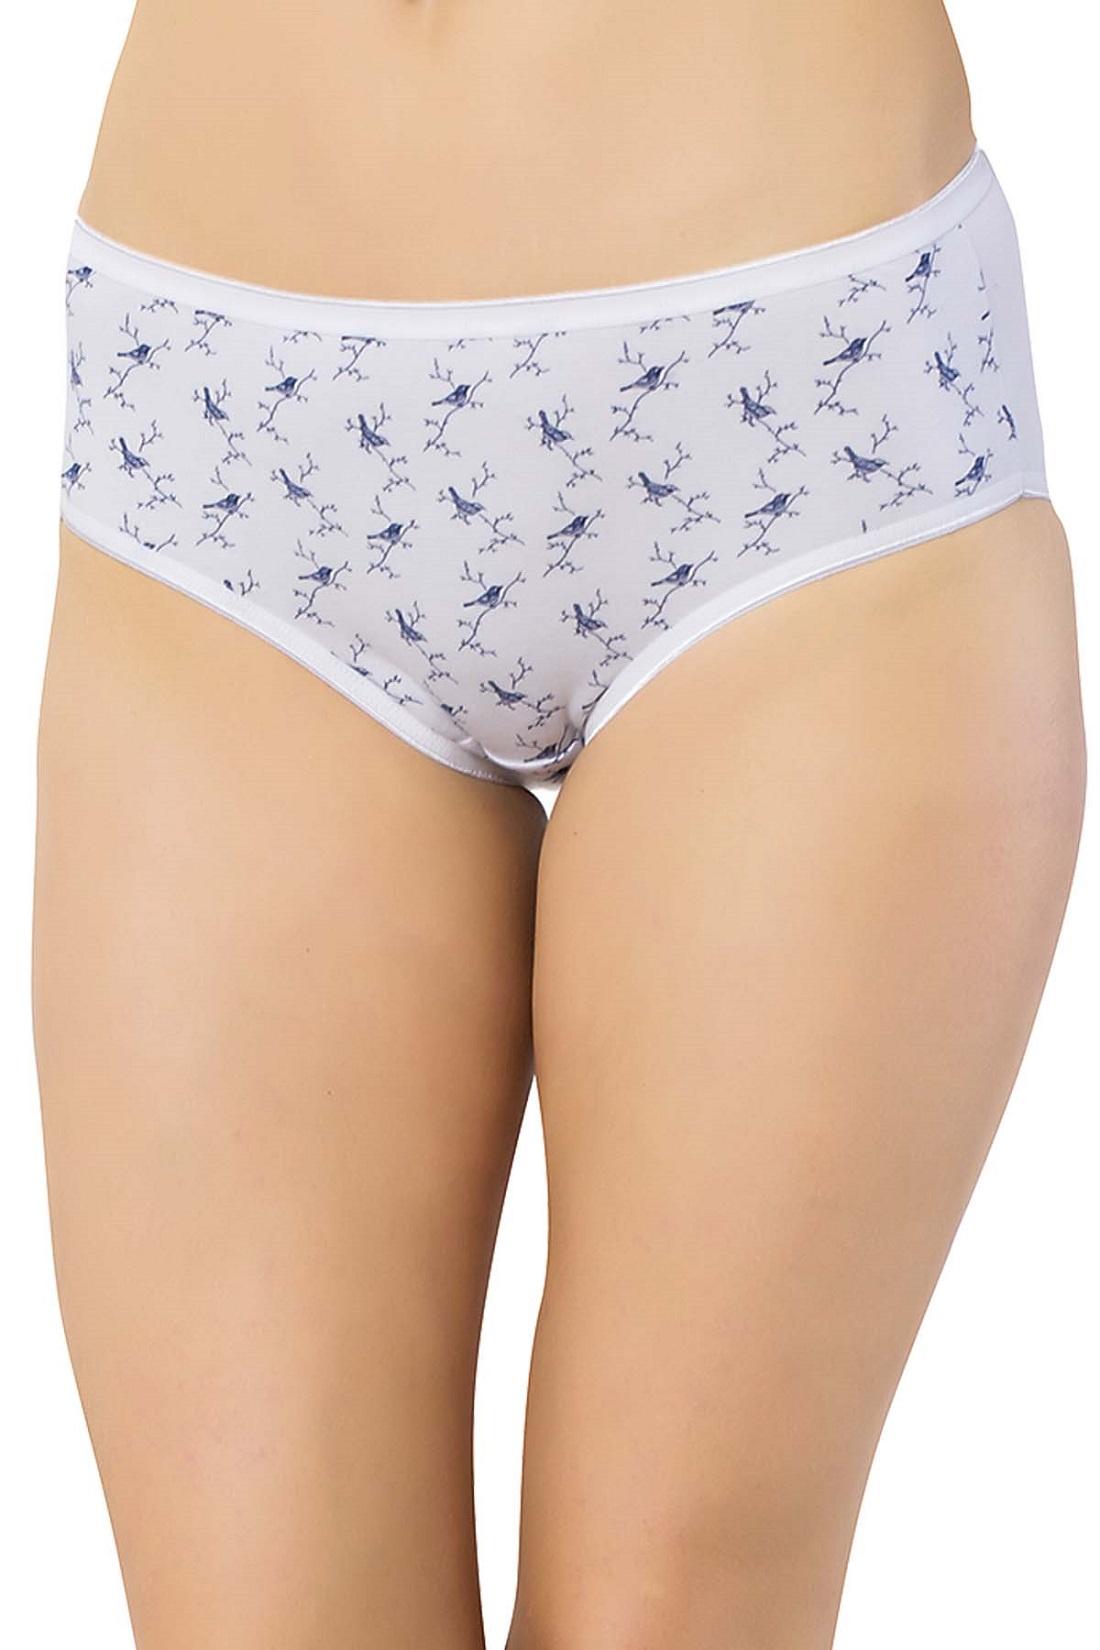 Трусы Ozkan Underwear трусы private structure 209 mu 0649 white